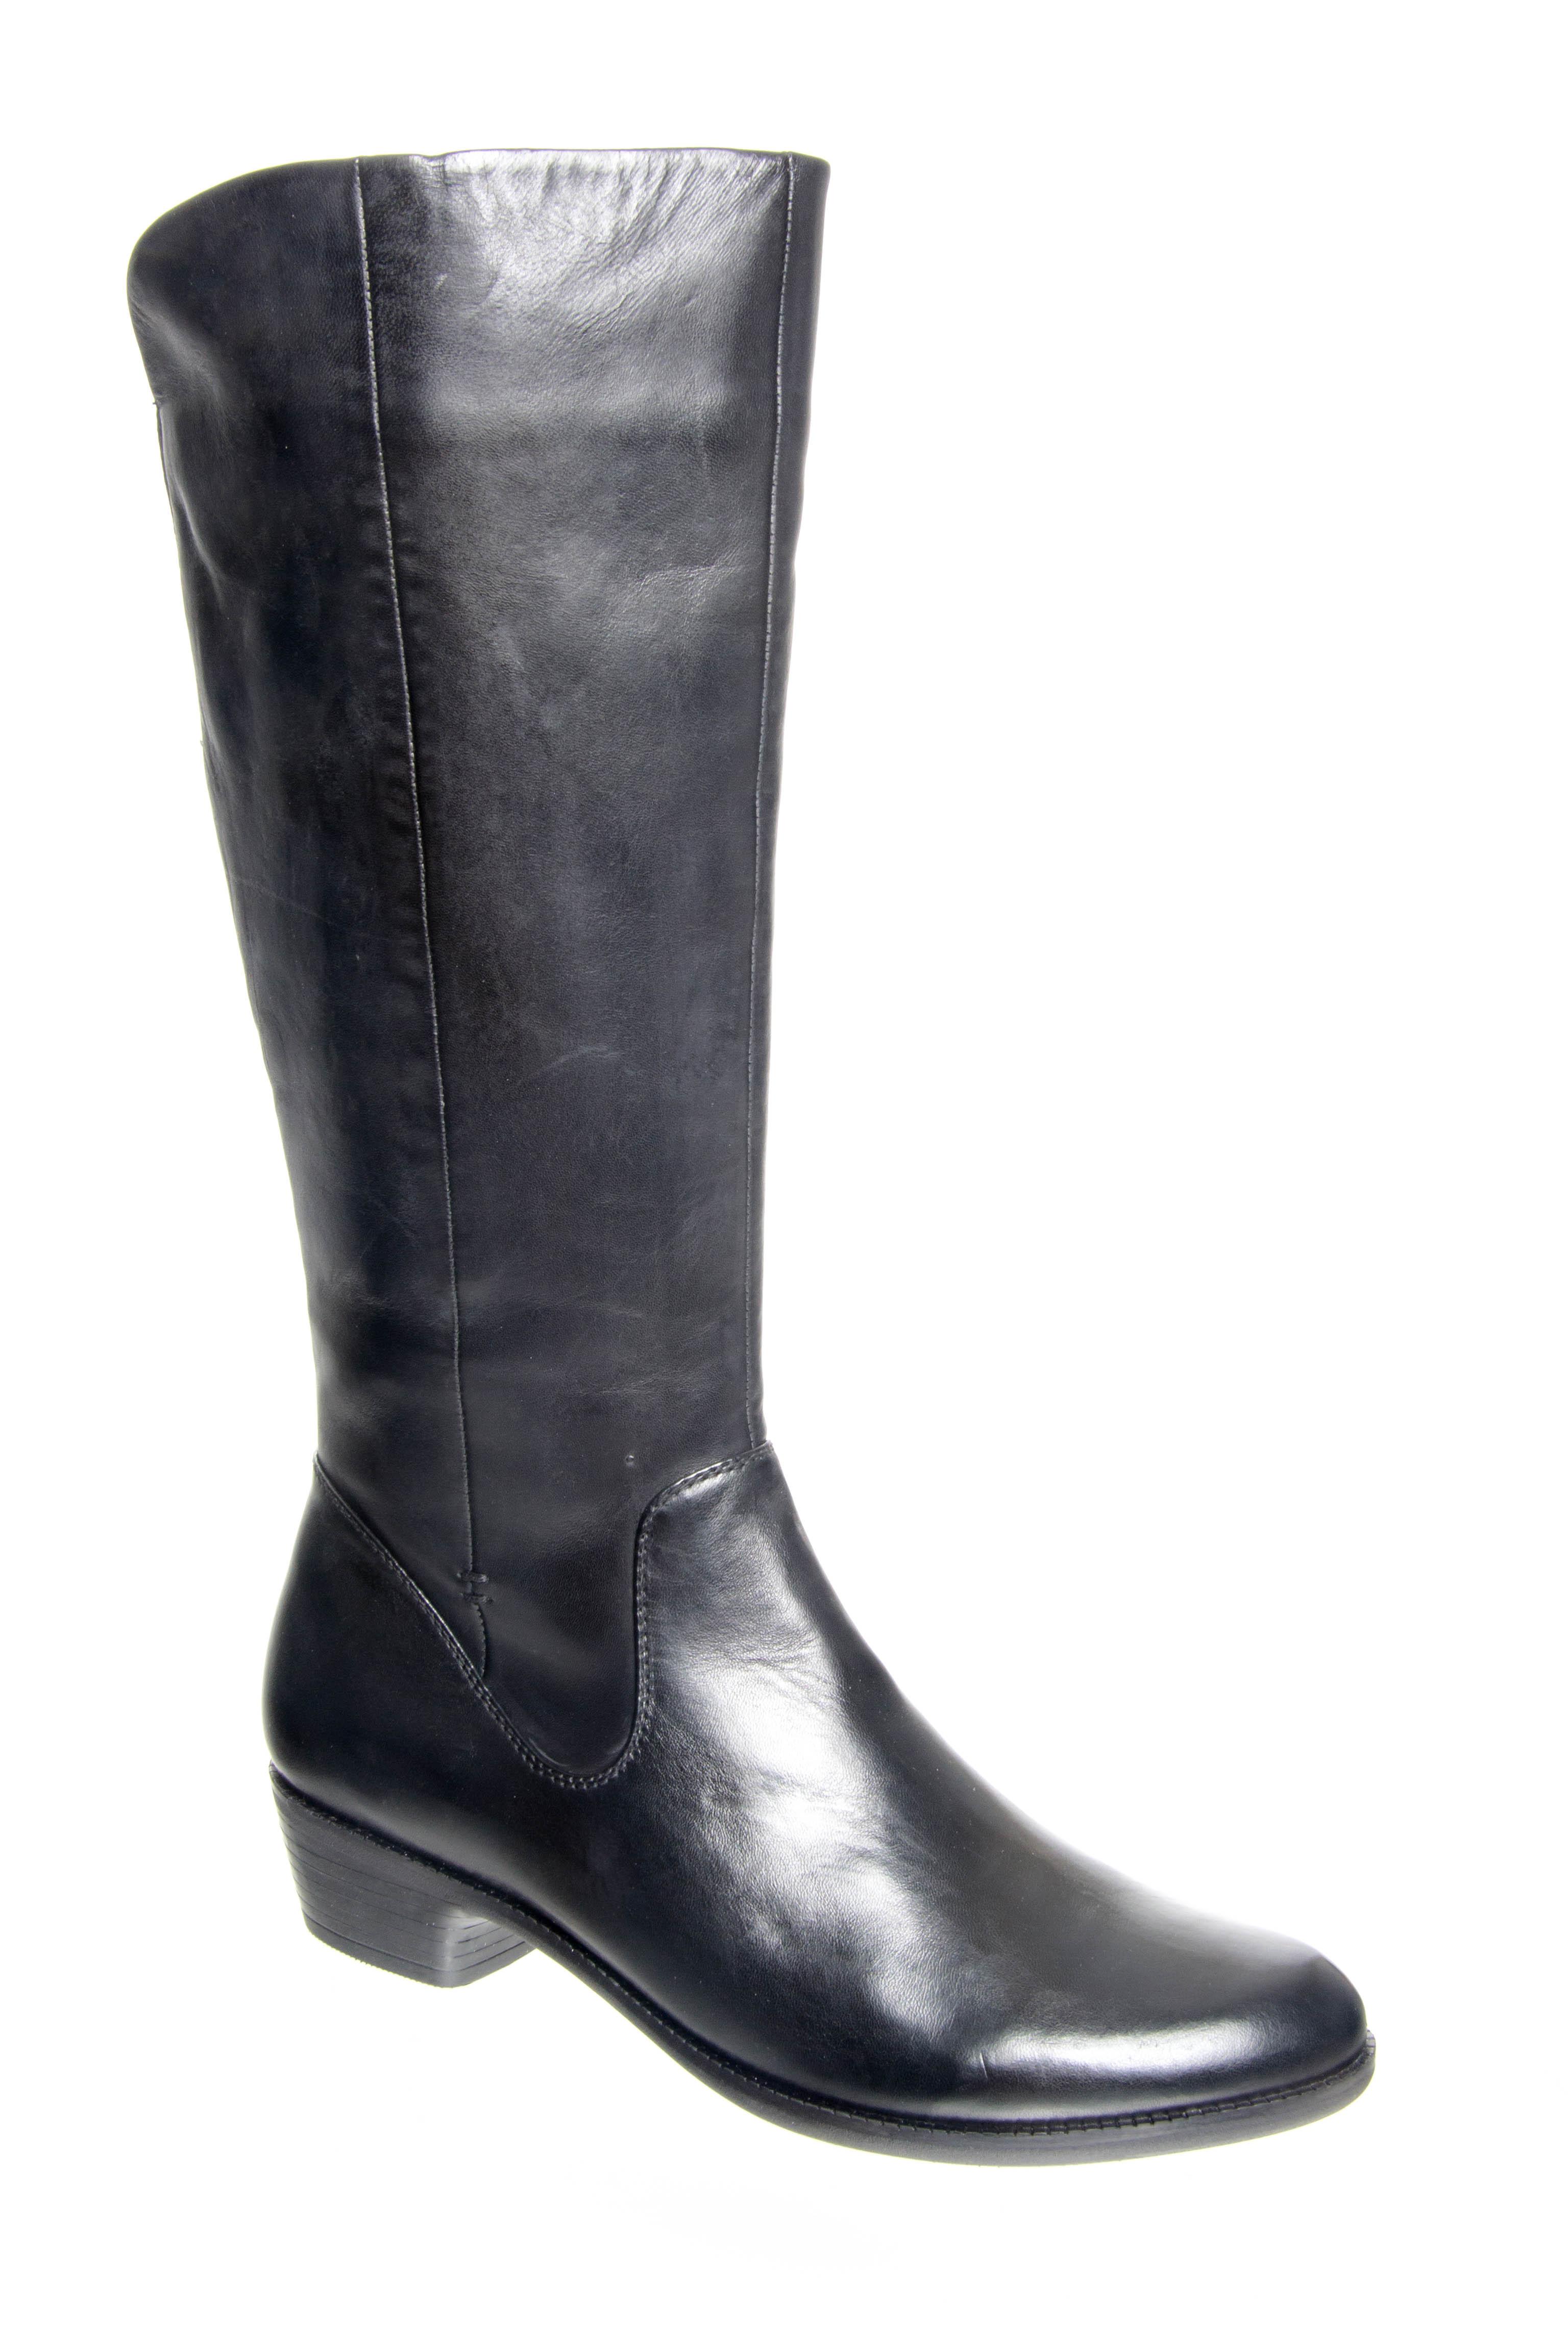 Spring Step Bolah Mid Calf Boots - Black